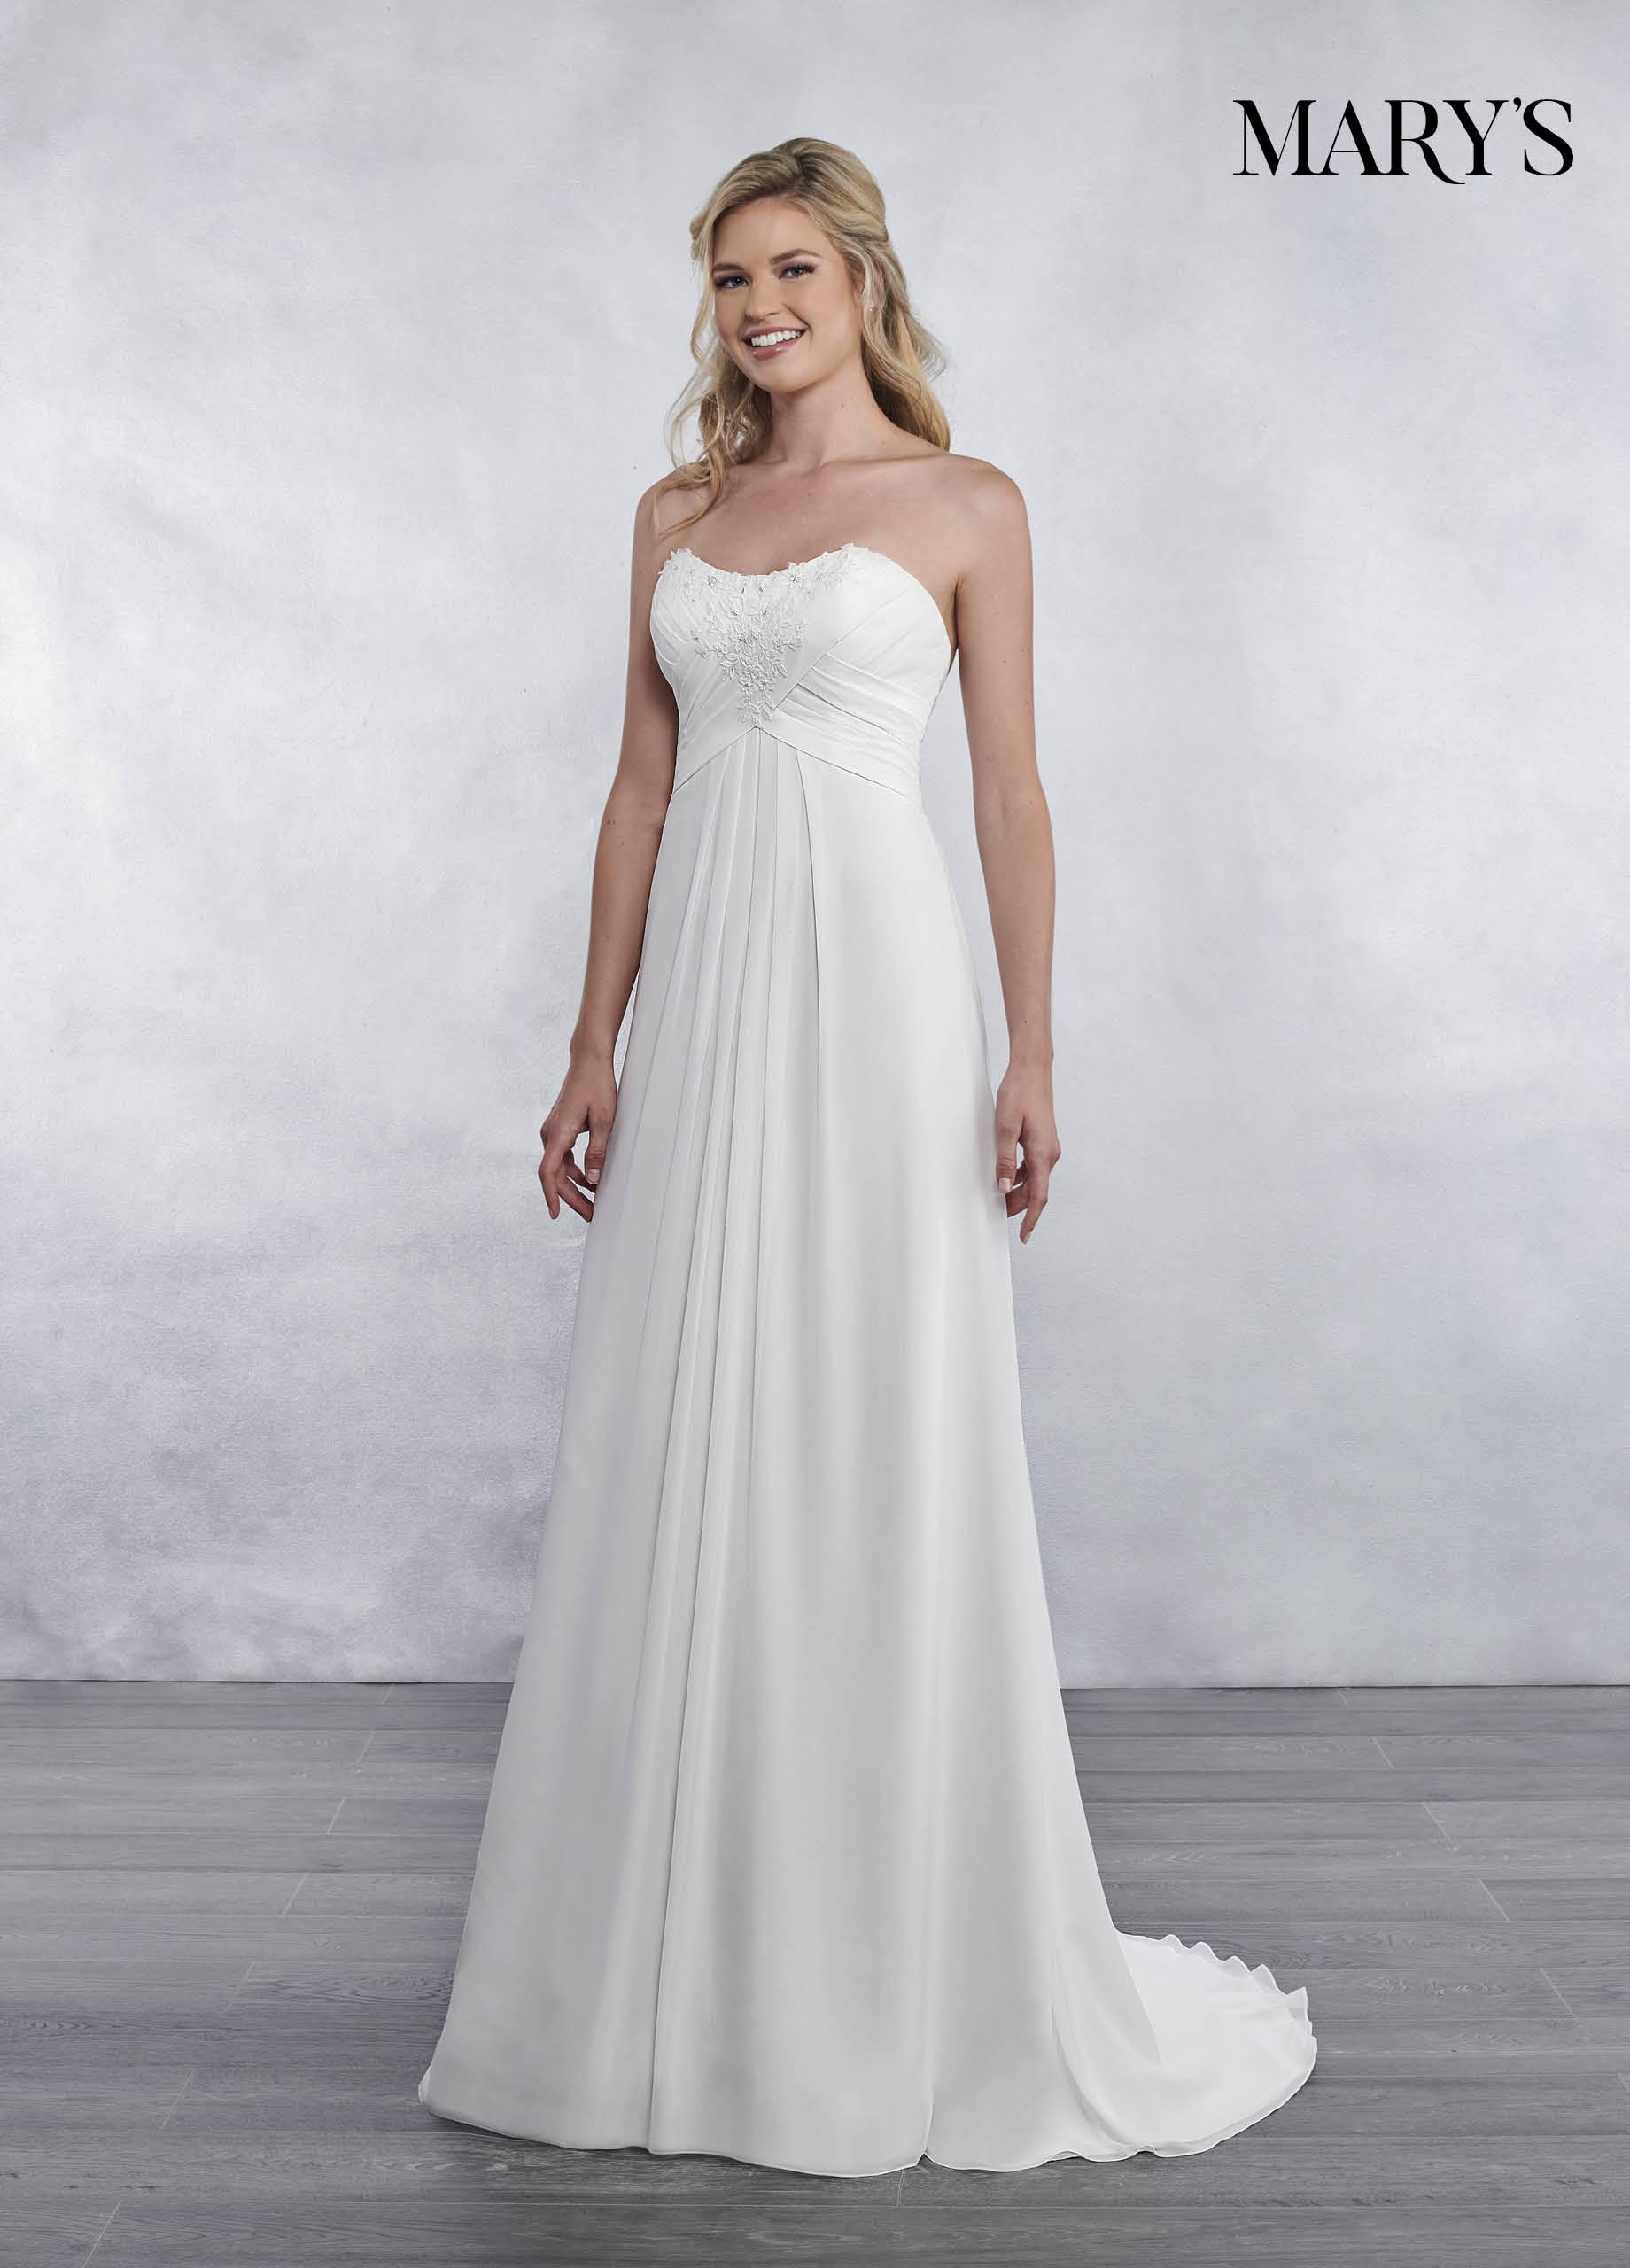 Bridal Wedding Dresses | Mary's | Style - MB1027